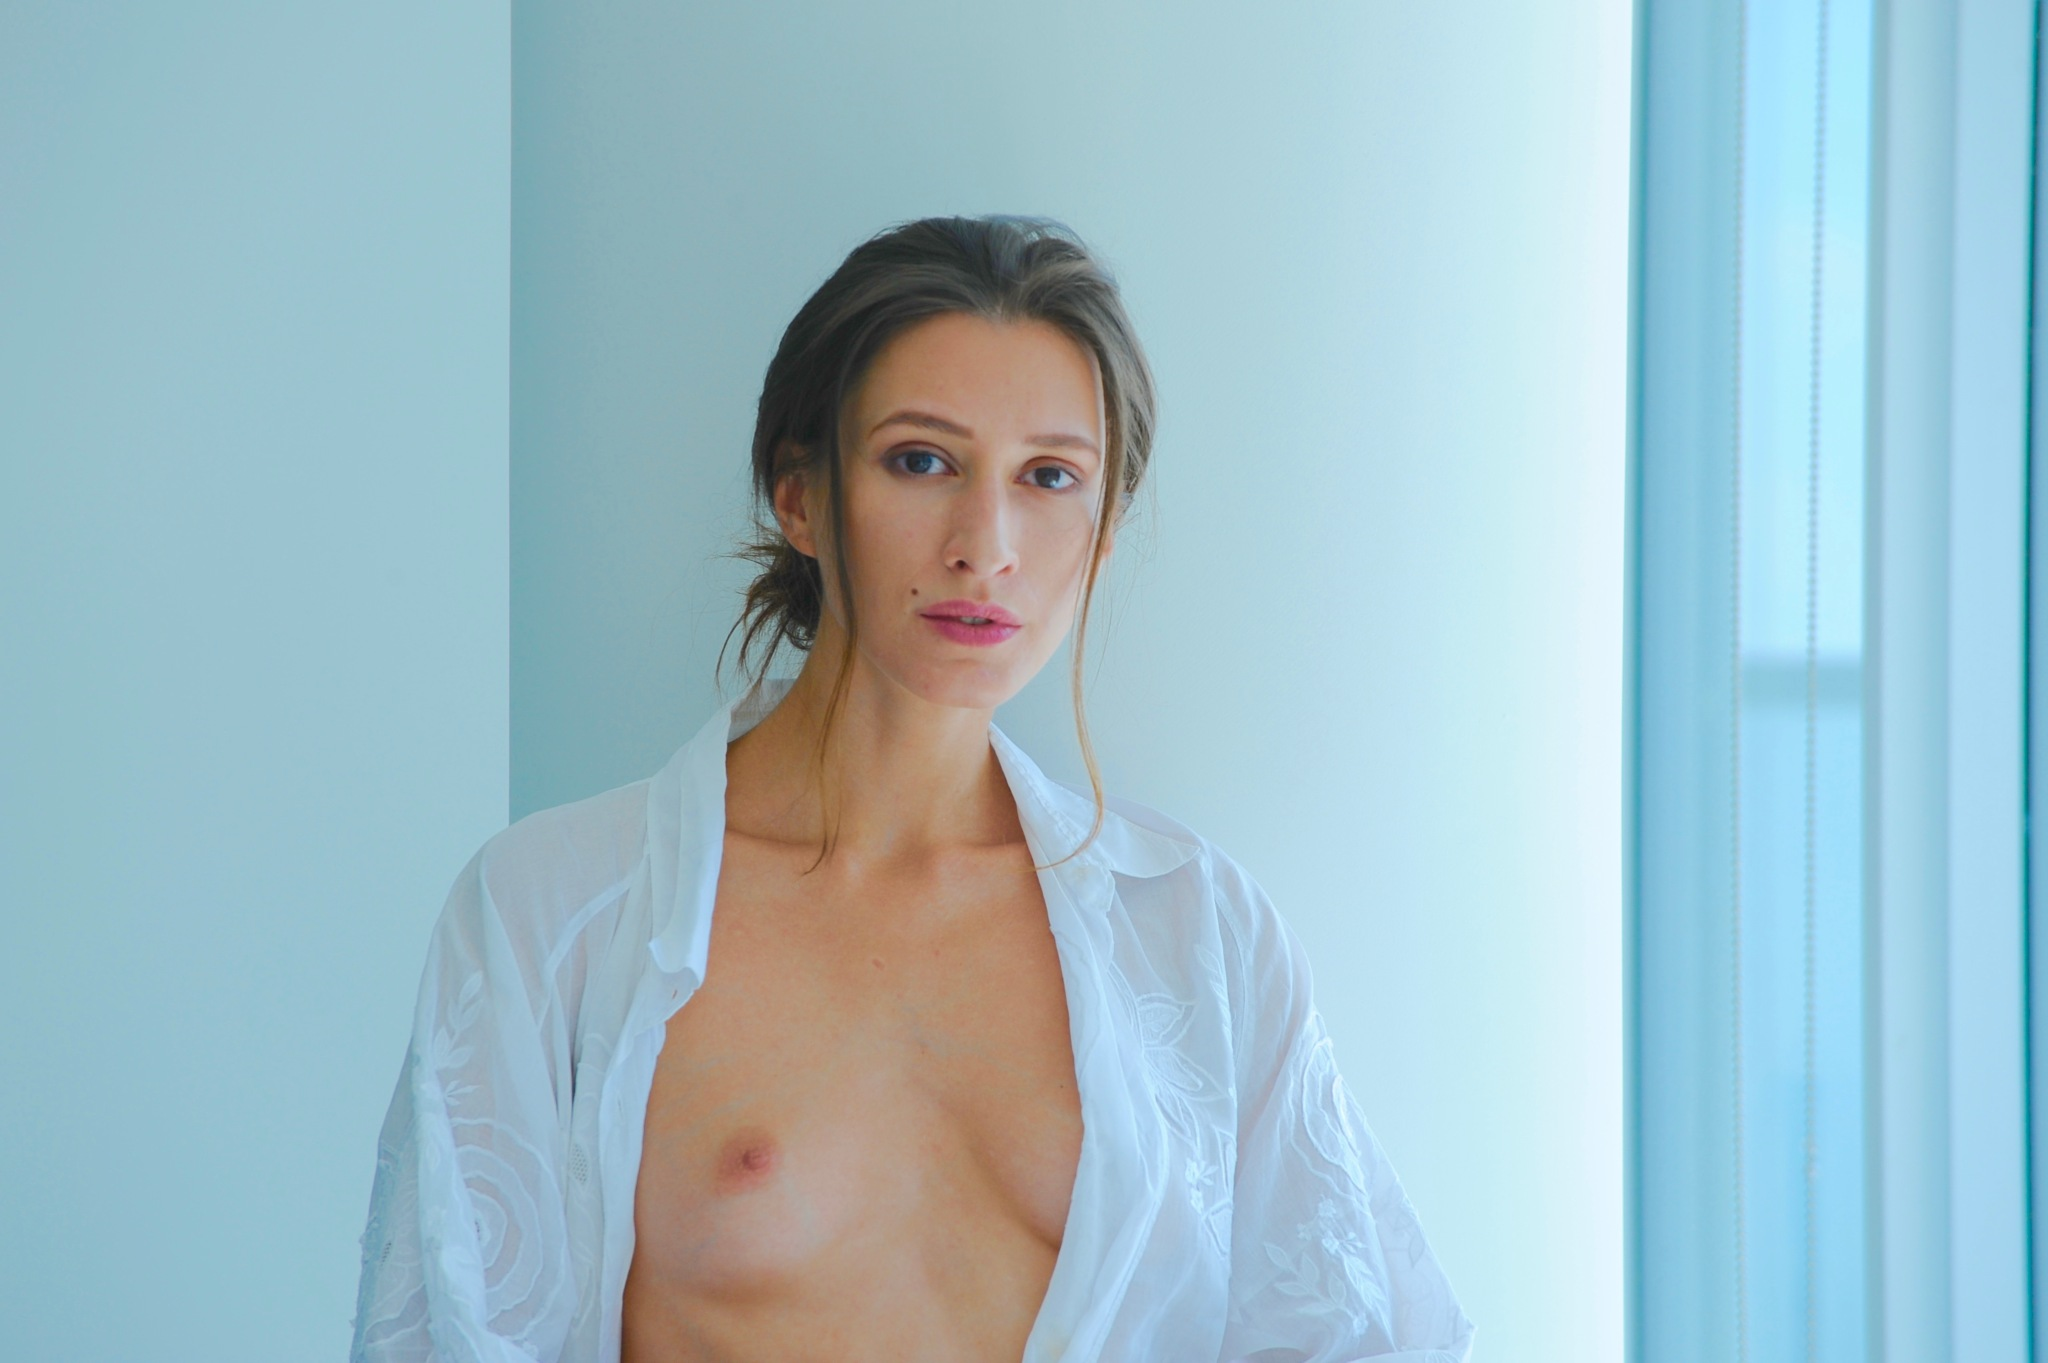 Shoot with Kate by Karen Bekker